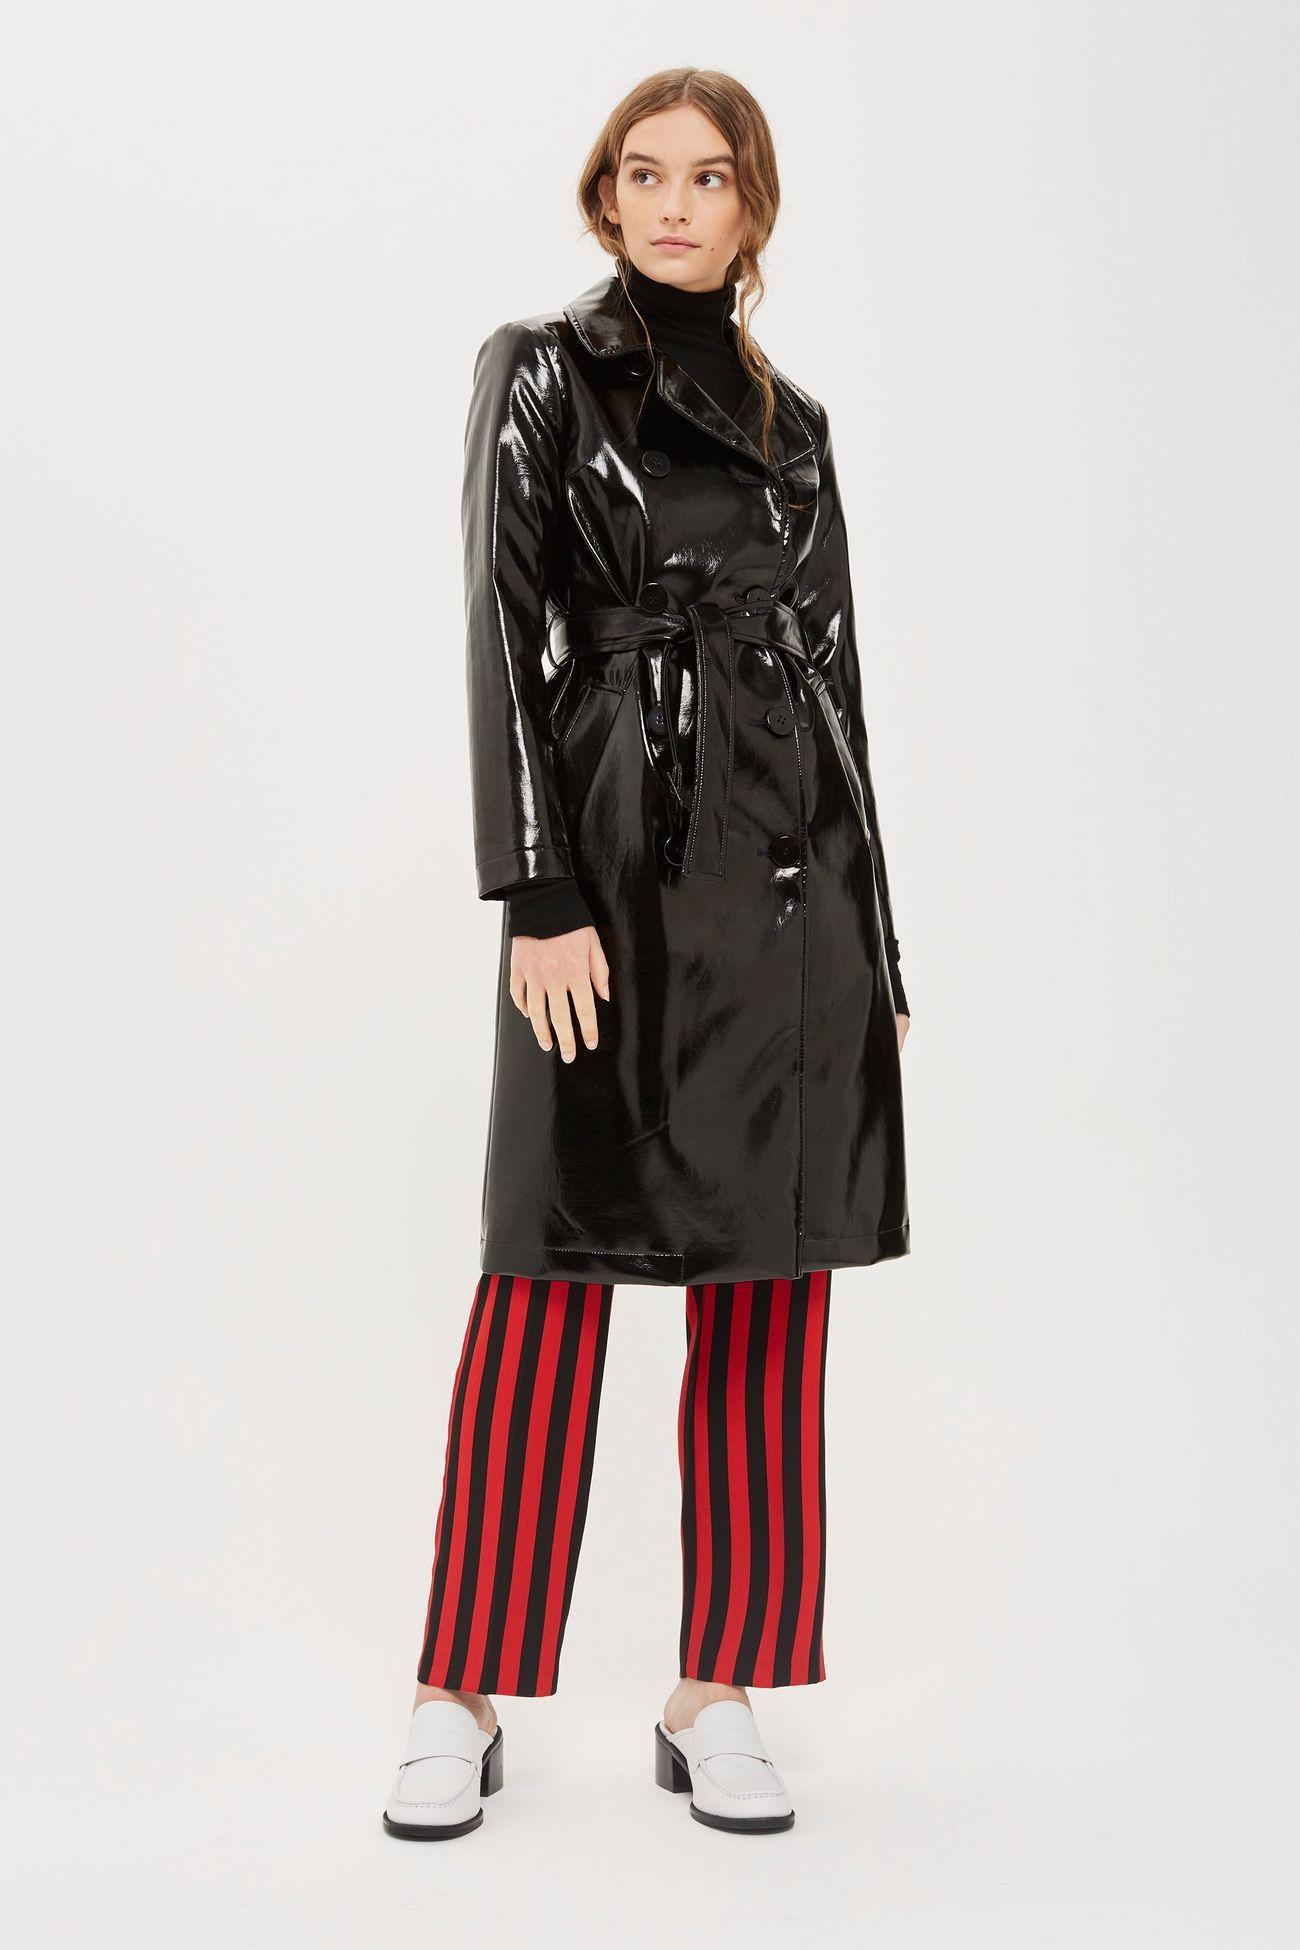 Clean Vinyl Trench Coat in 2020 | Stylish winter coats ...